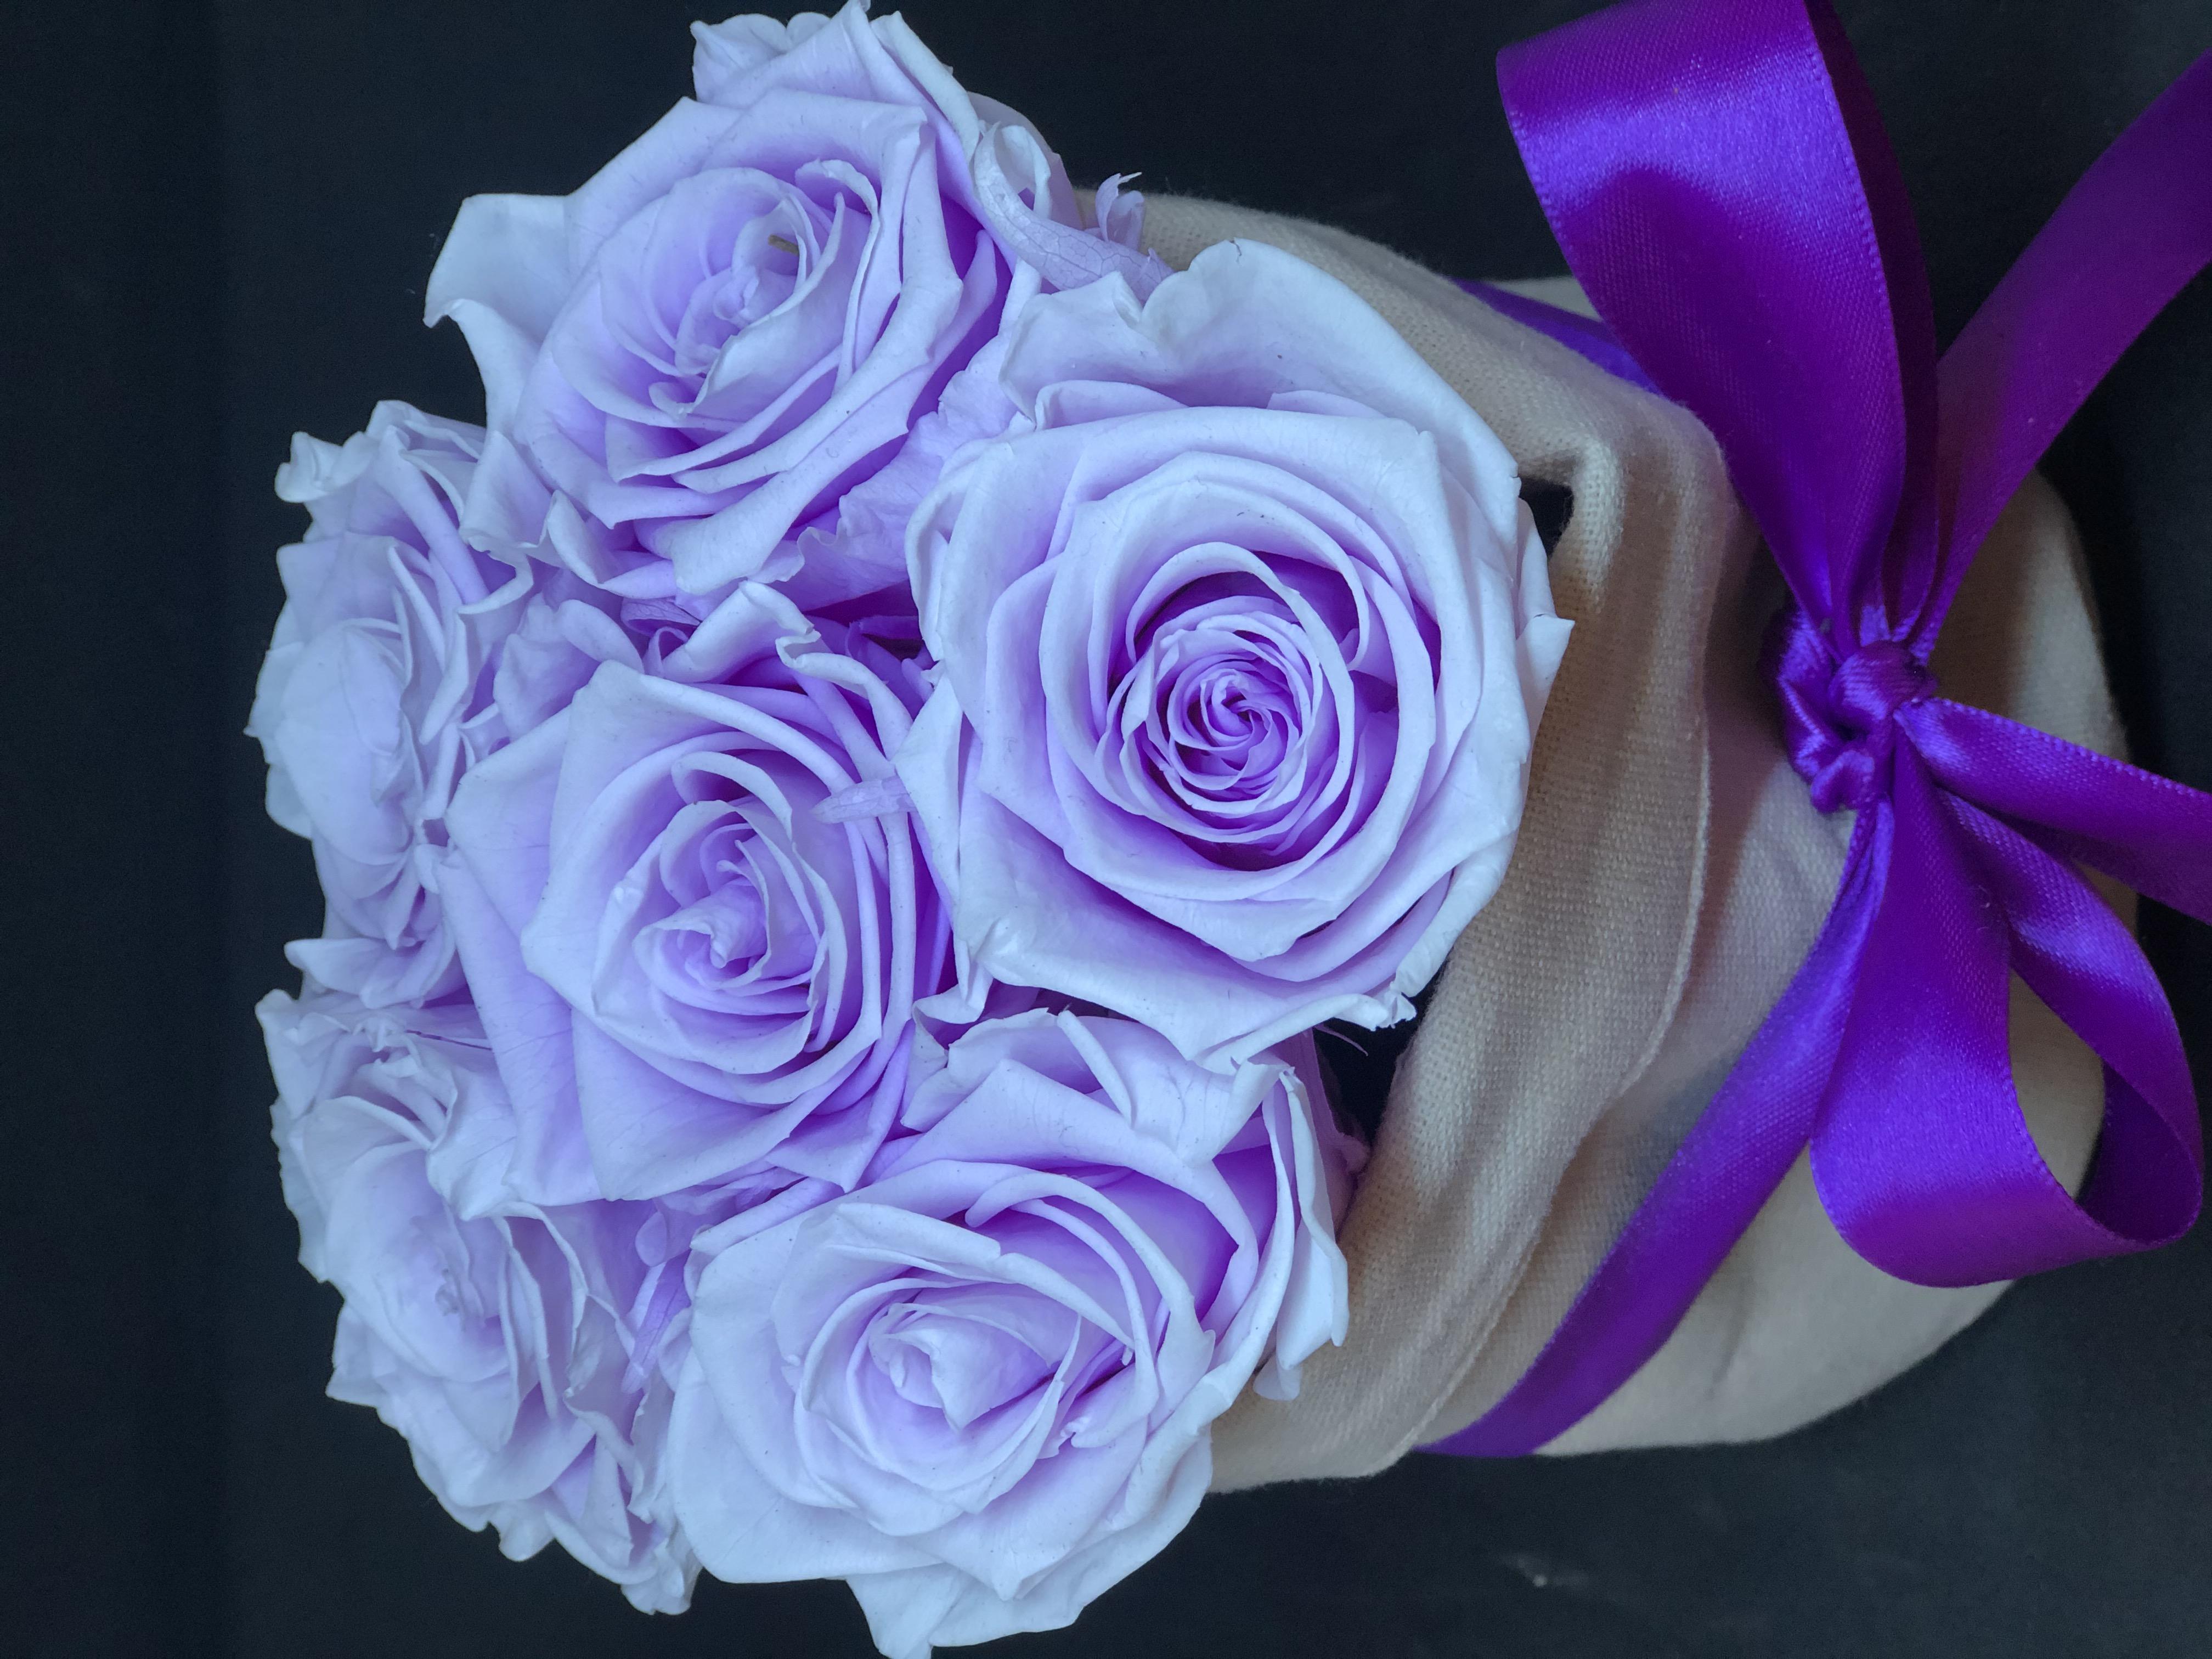 Sacchettino lino con rose eterne